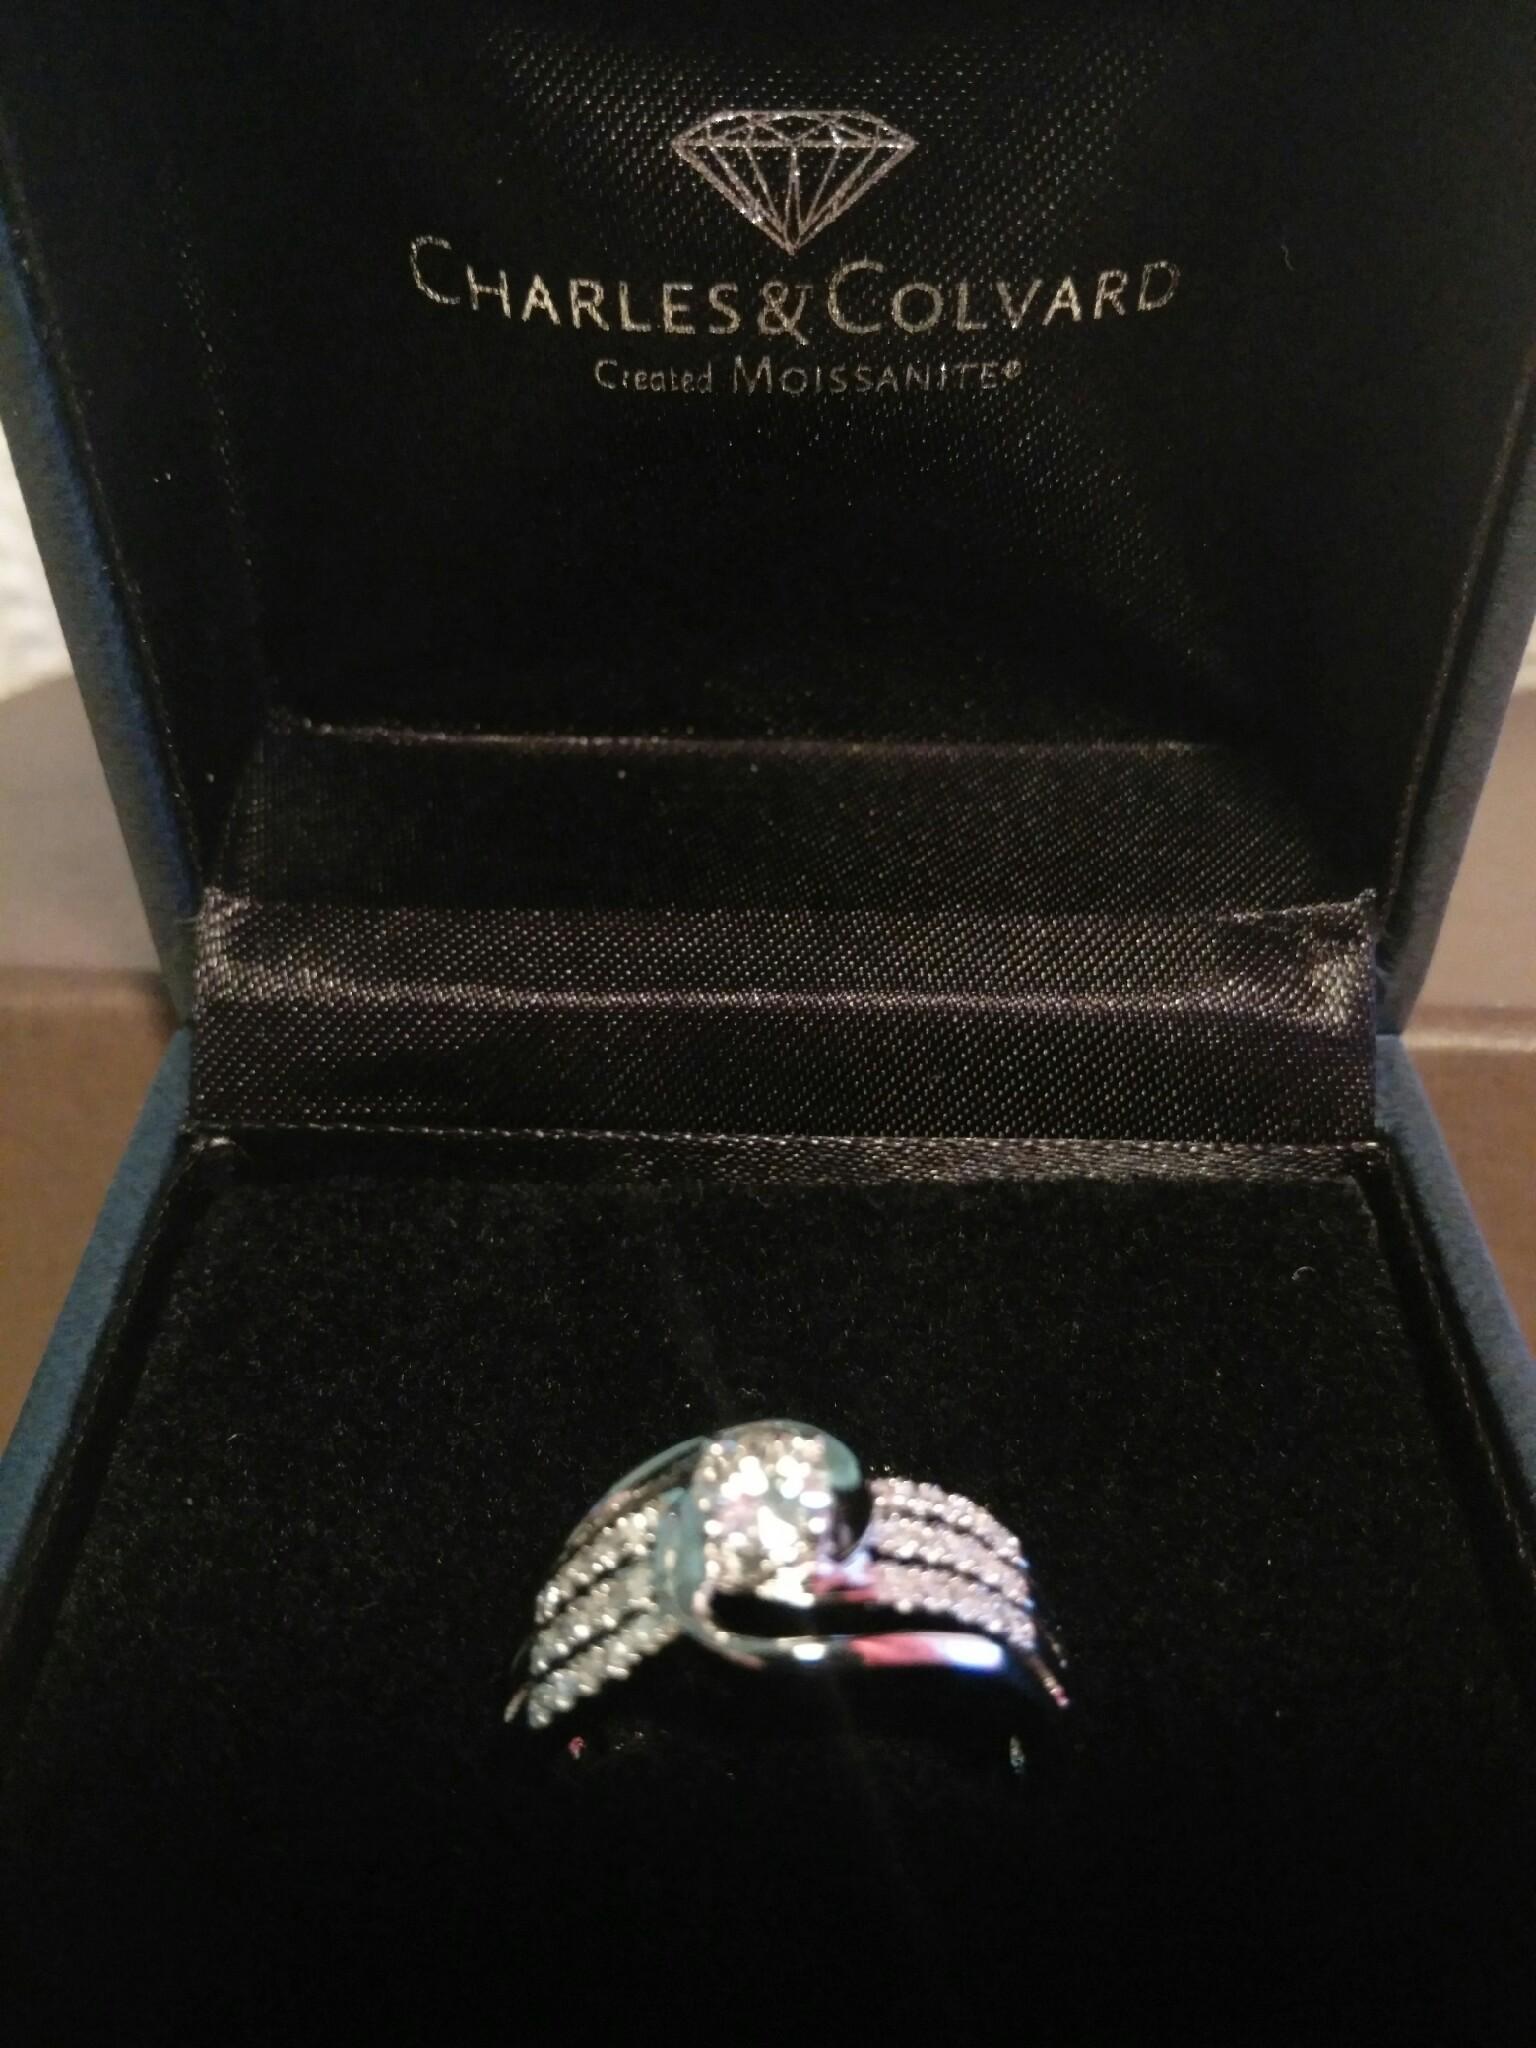 Charles & Colvard Created Moissanite Ring Box.jpg